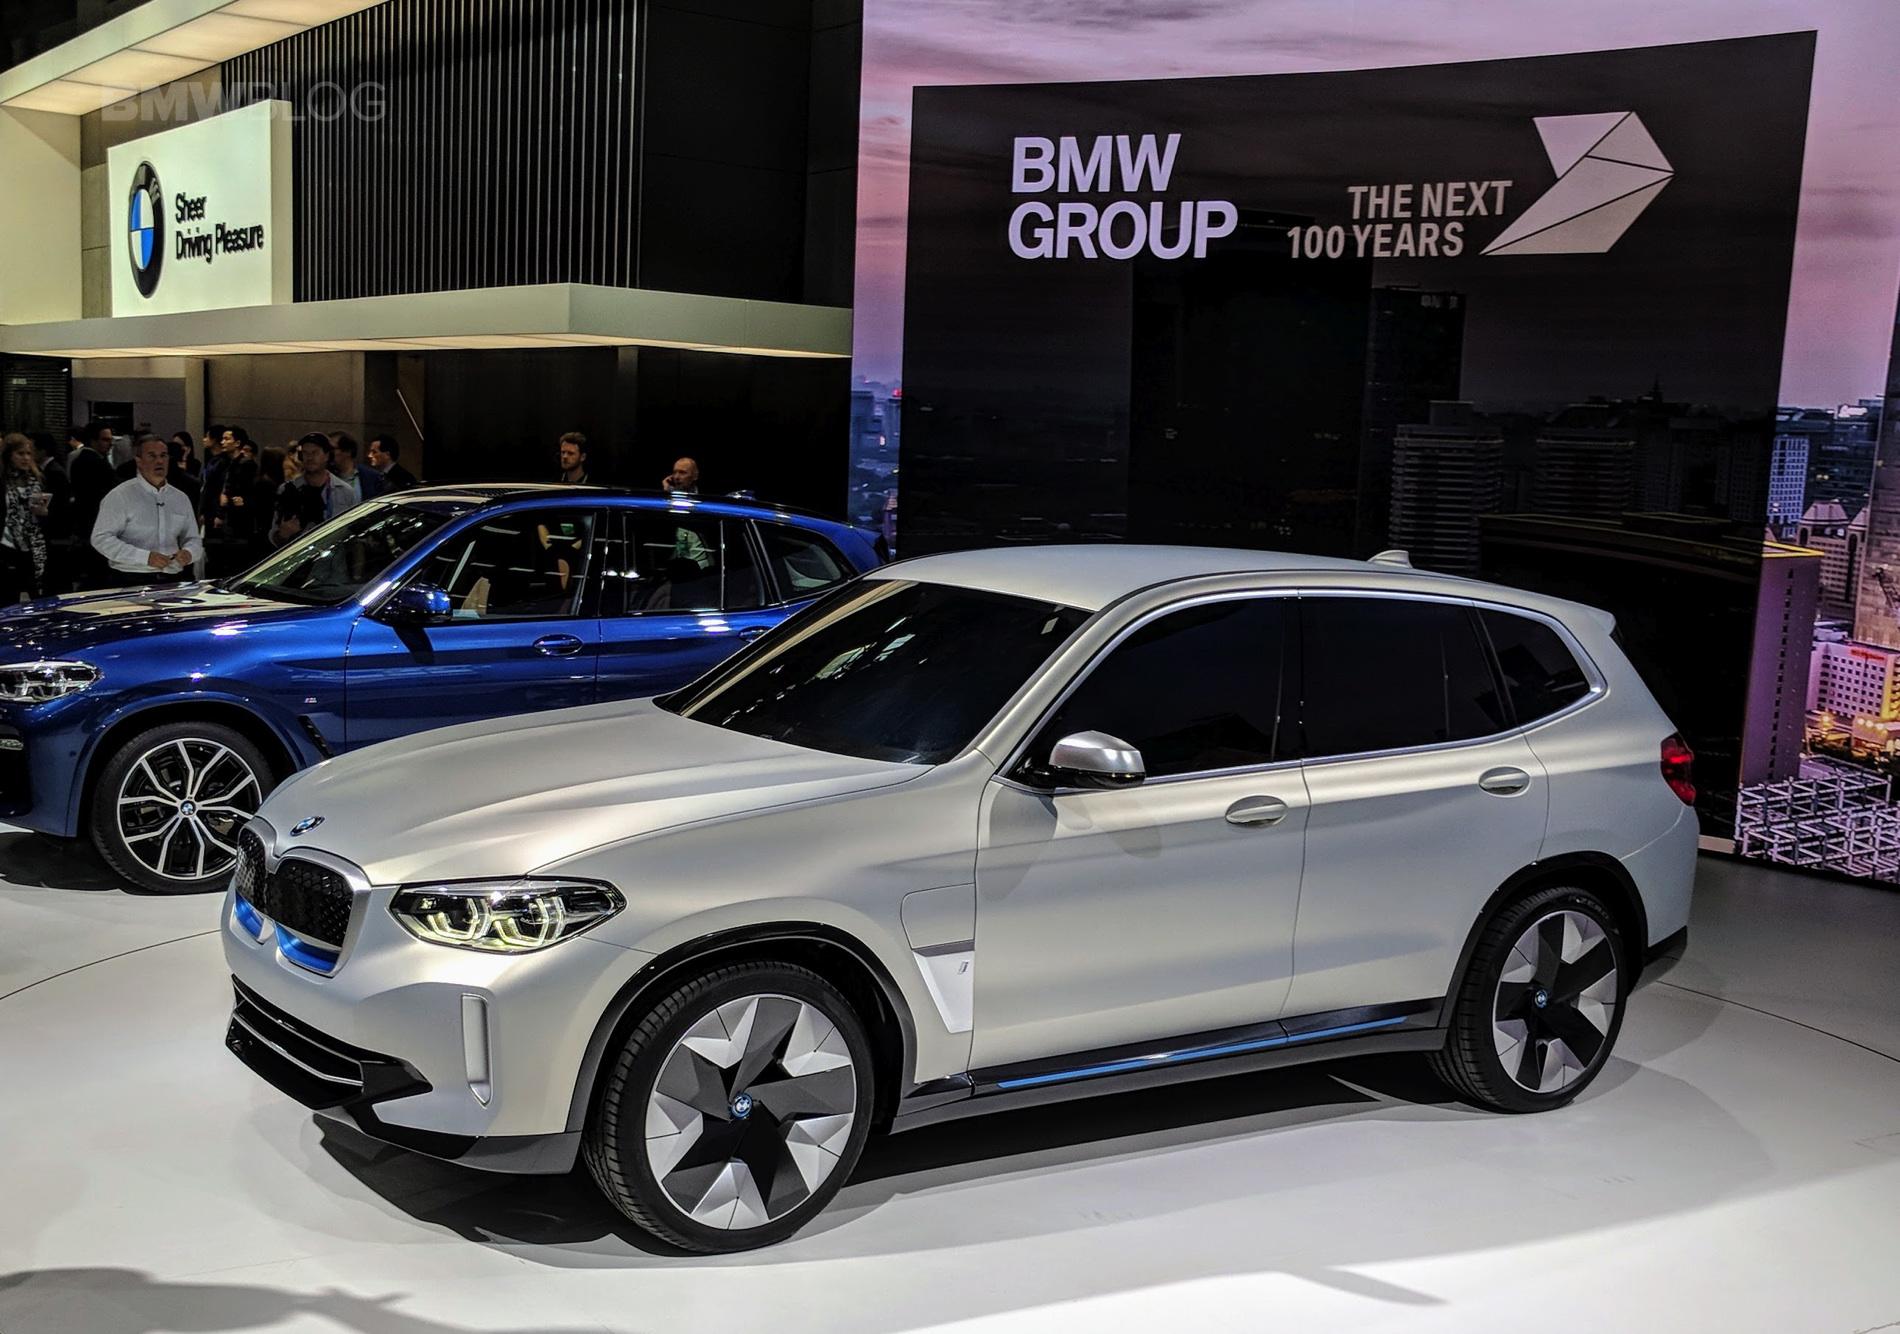 BMW Begins Production on Electric BMW iX3